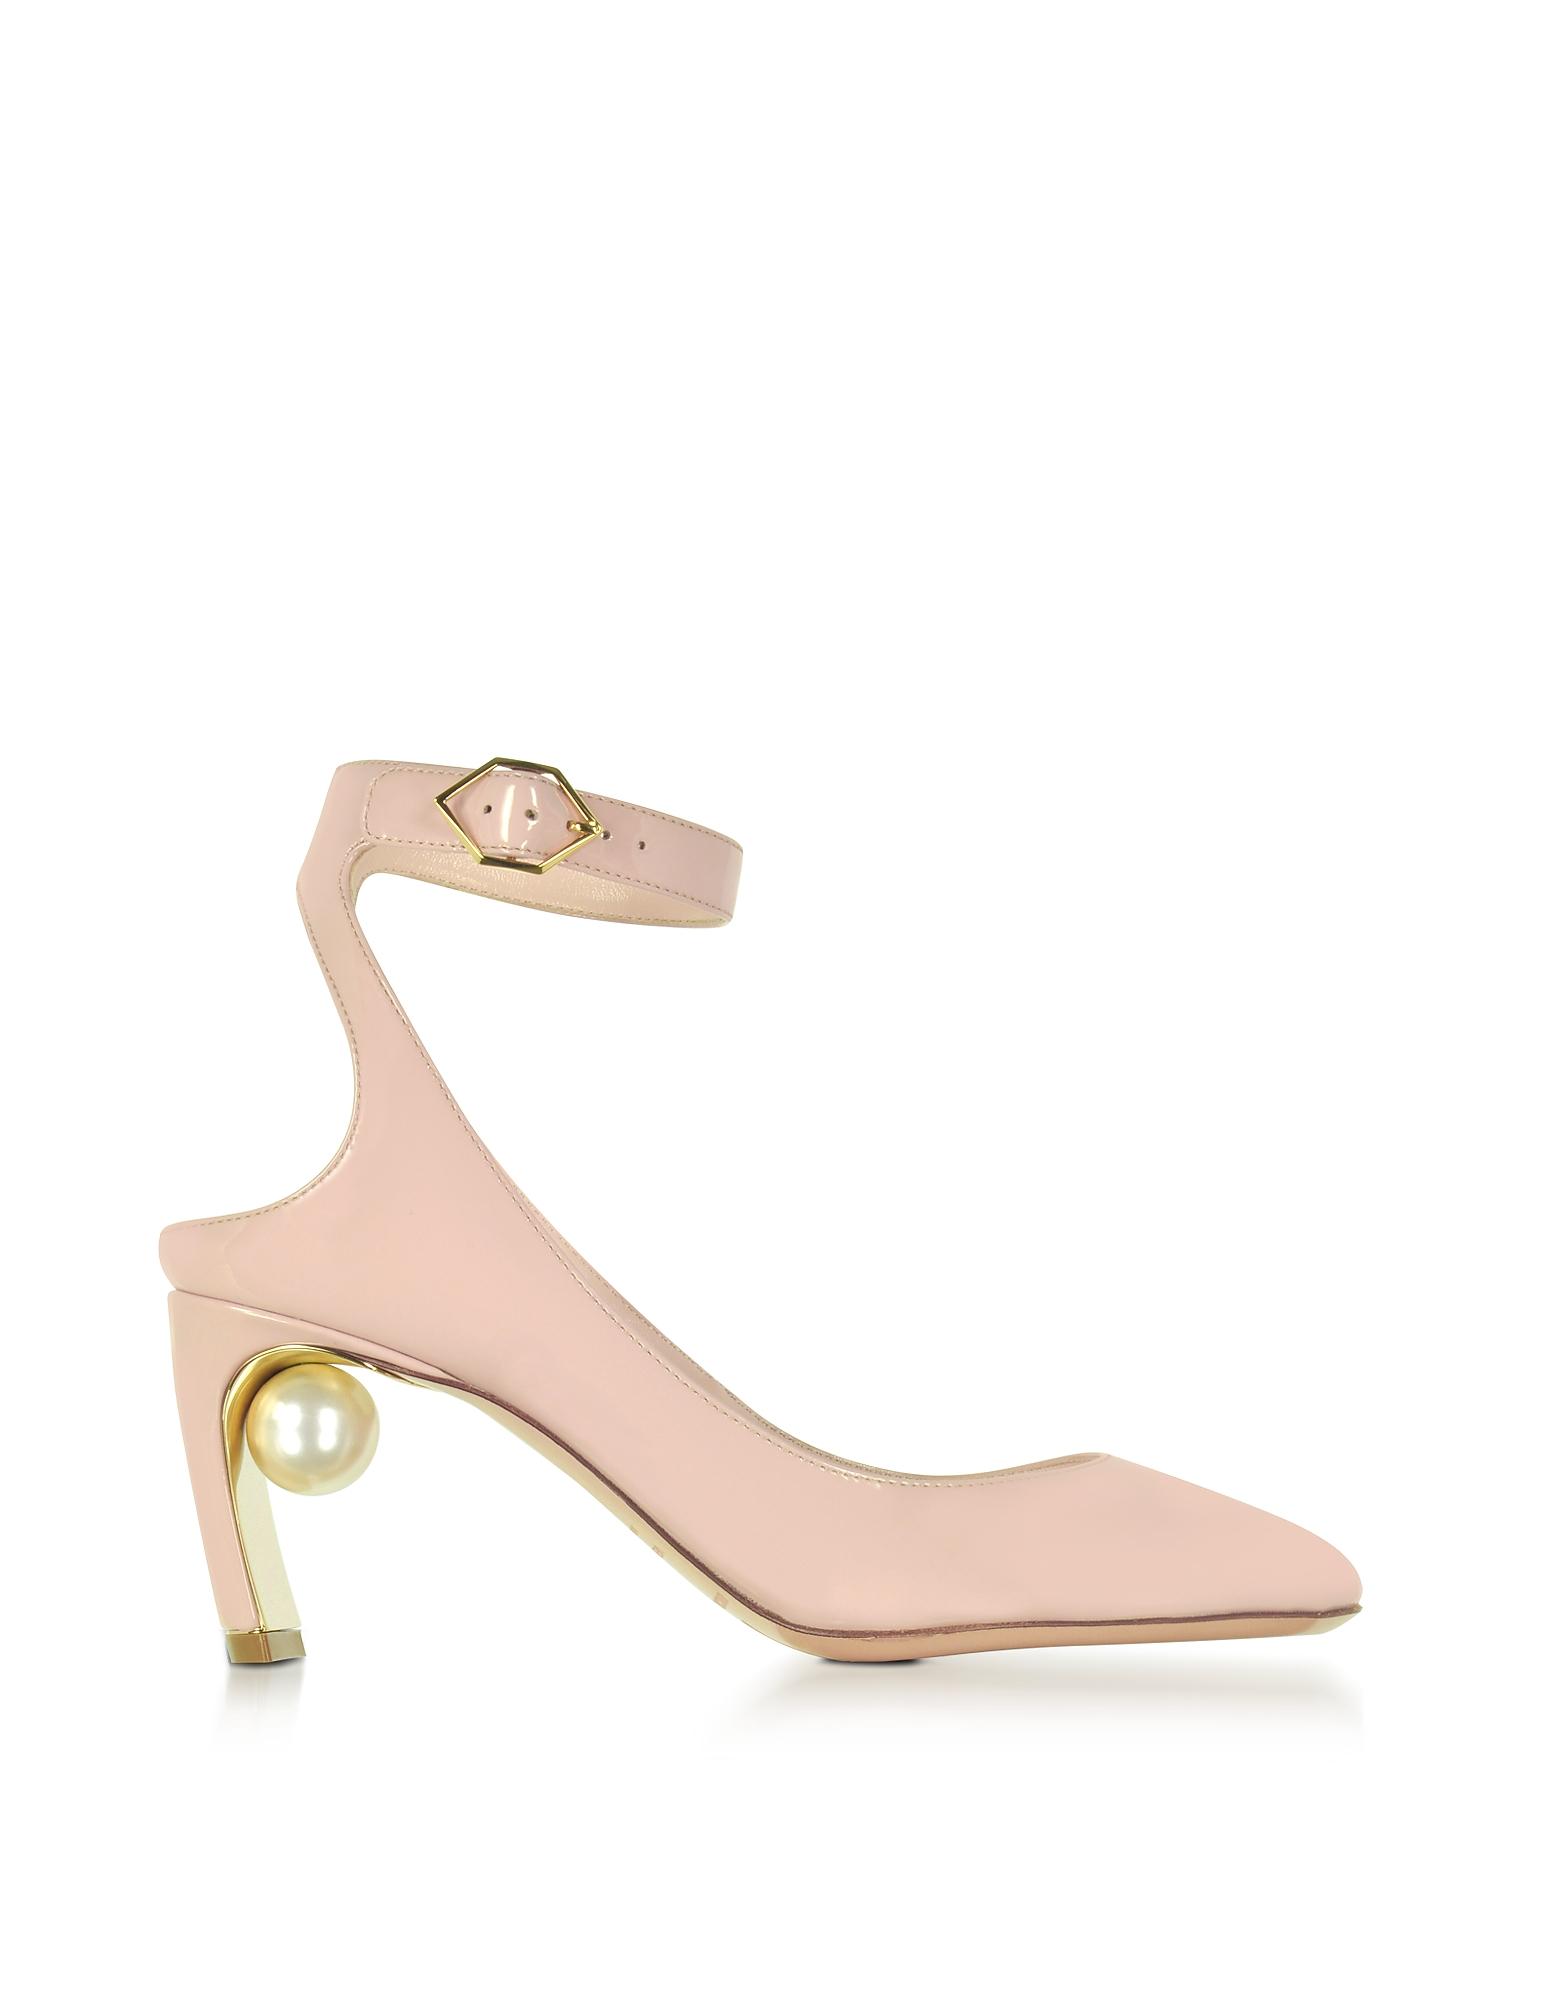 Nicholas Kirkwood Shoes, Lola Light Blush Patent Leather Pearl Pump